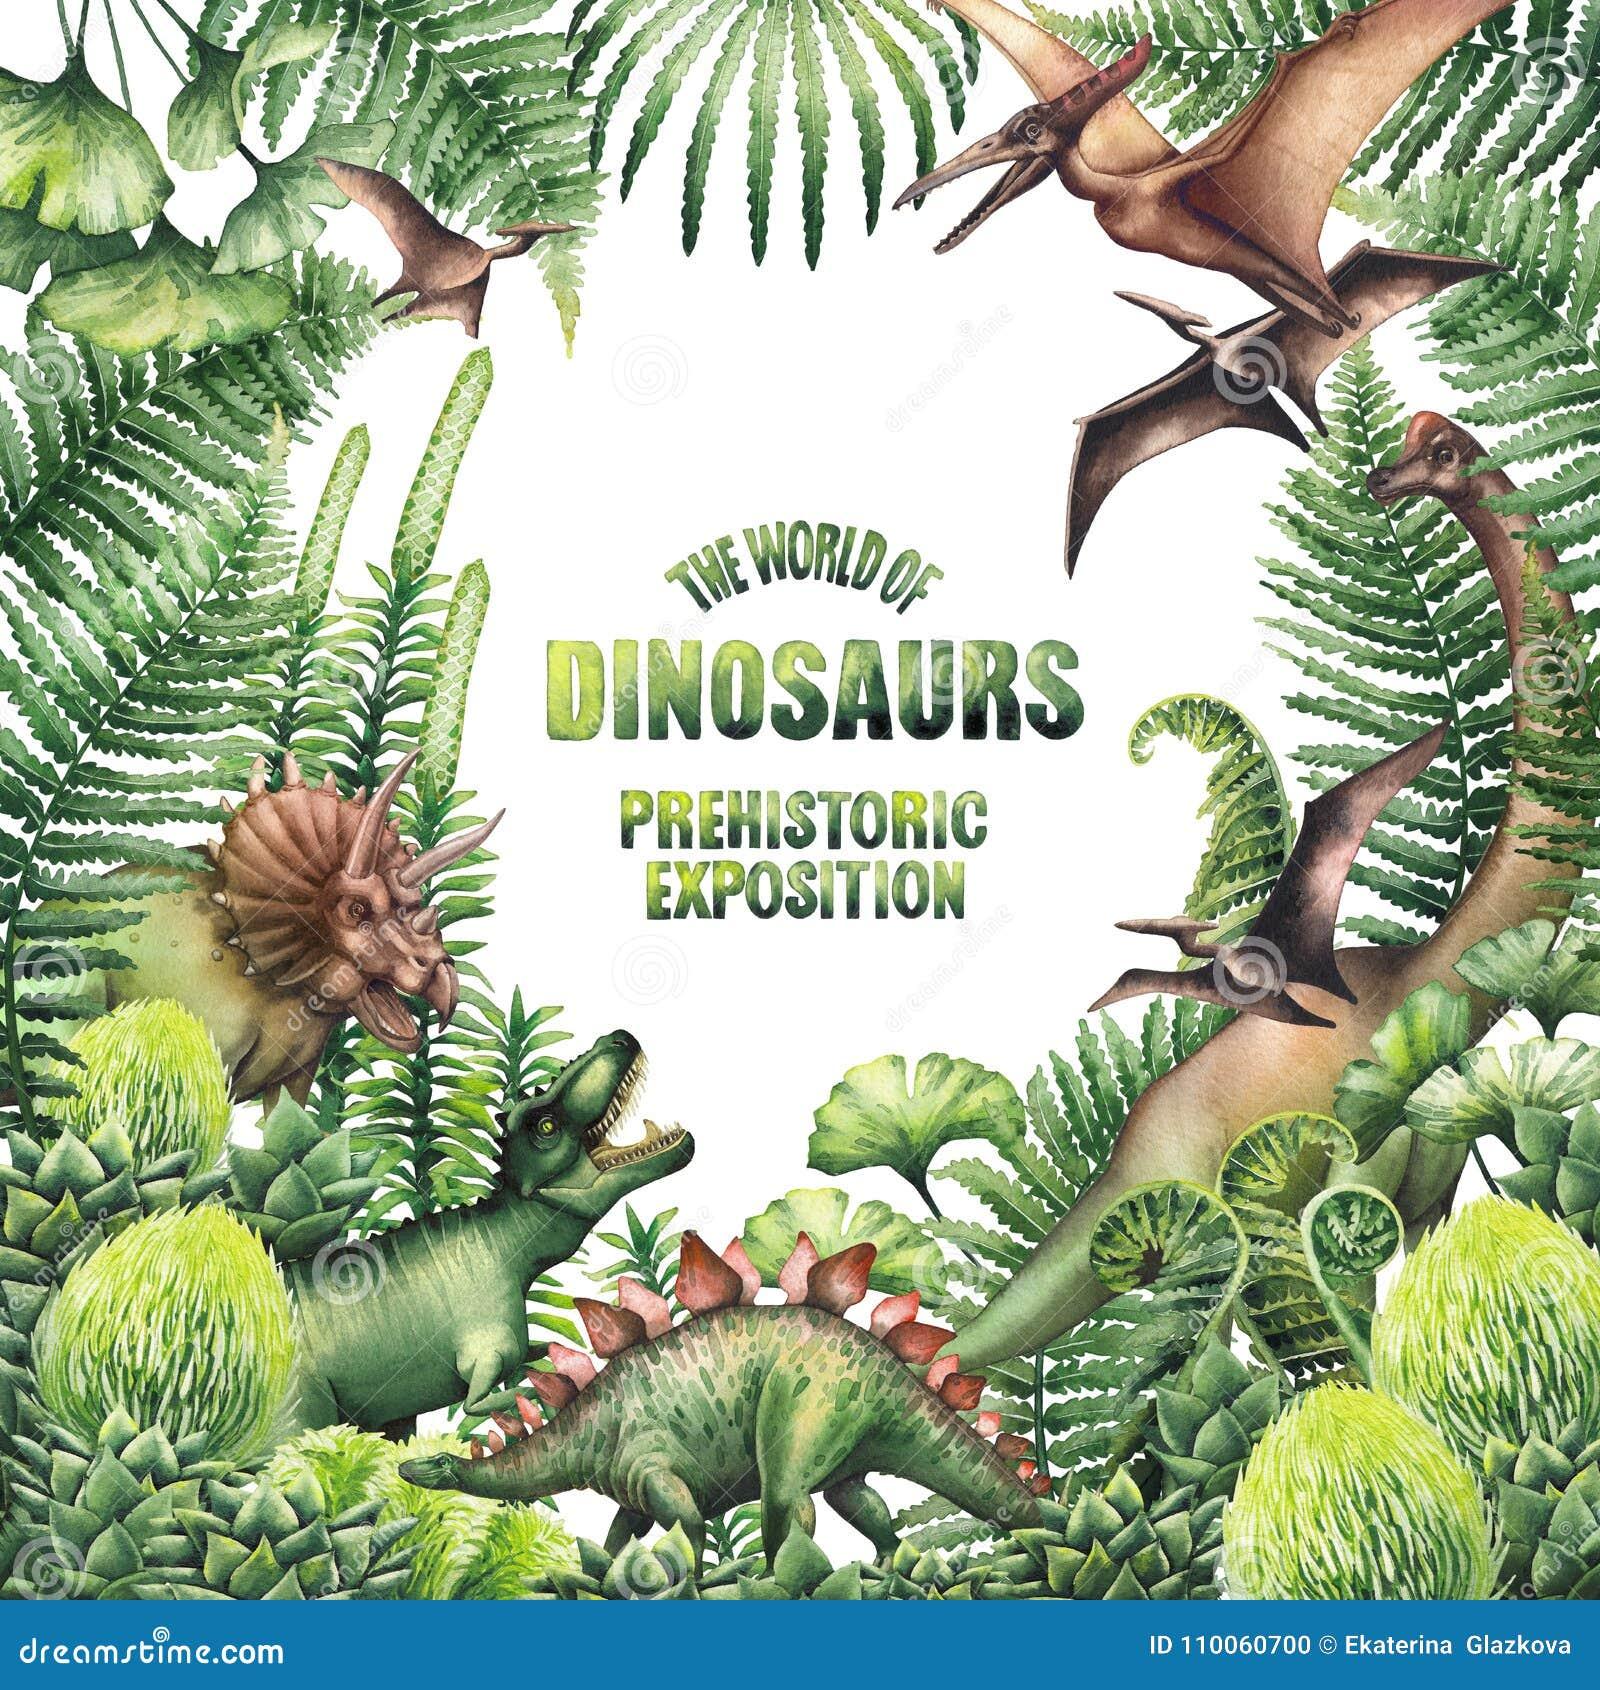 Akwarela projekt z prehistorycznymi roślinami i dinosaurami